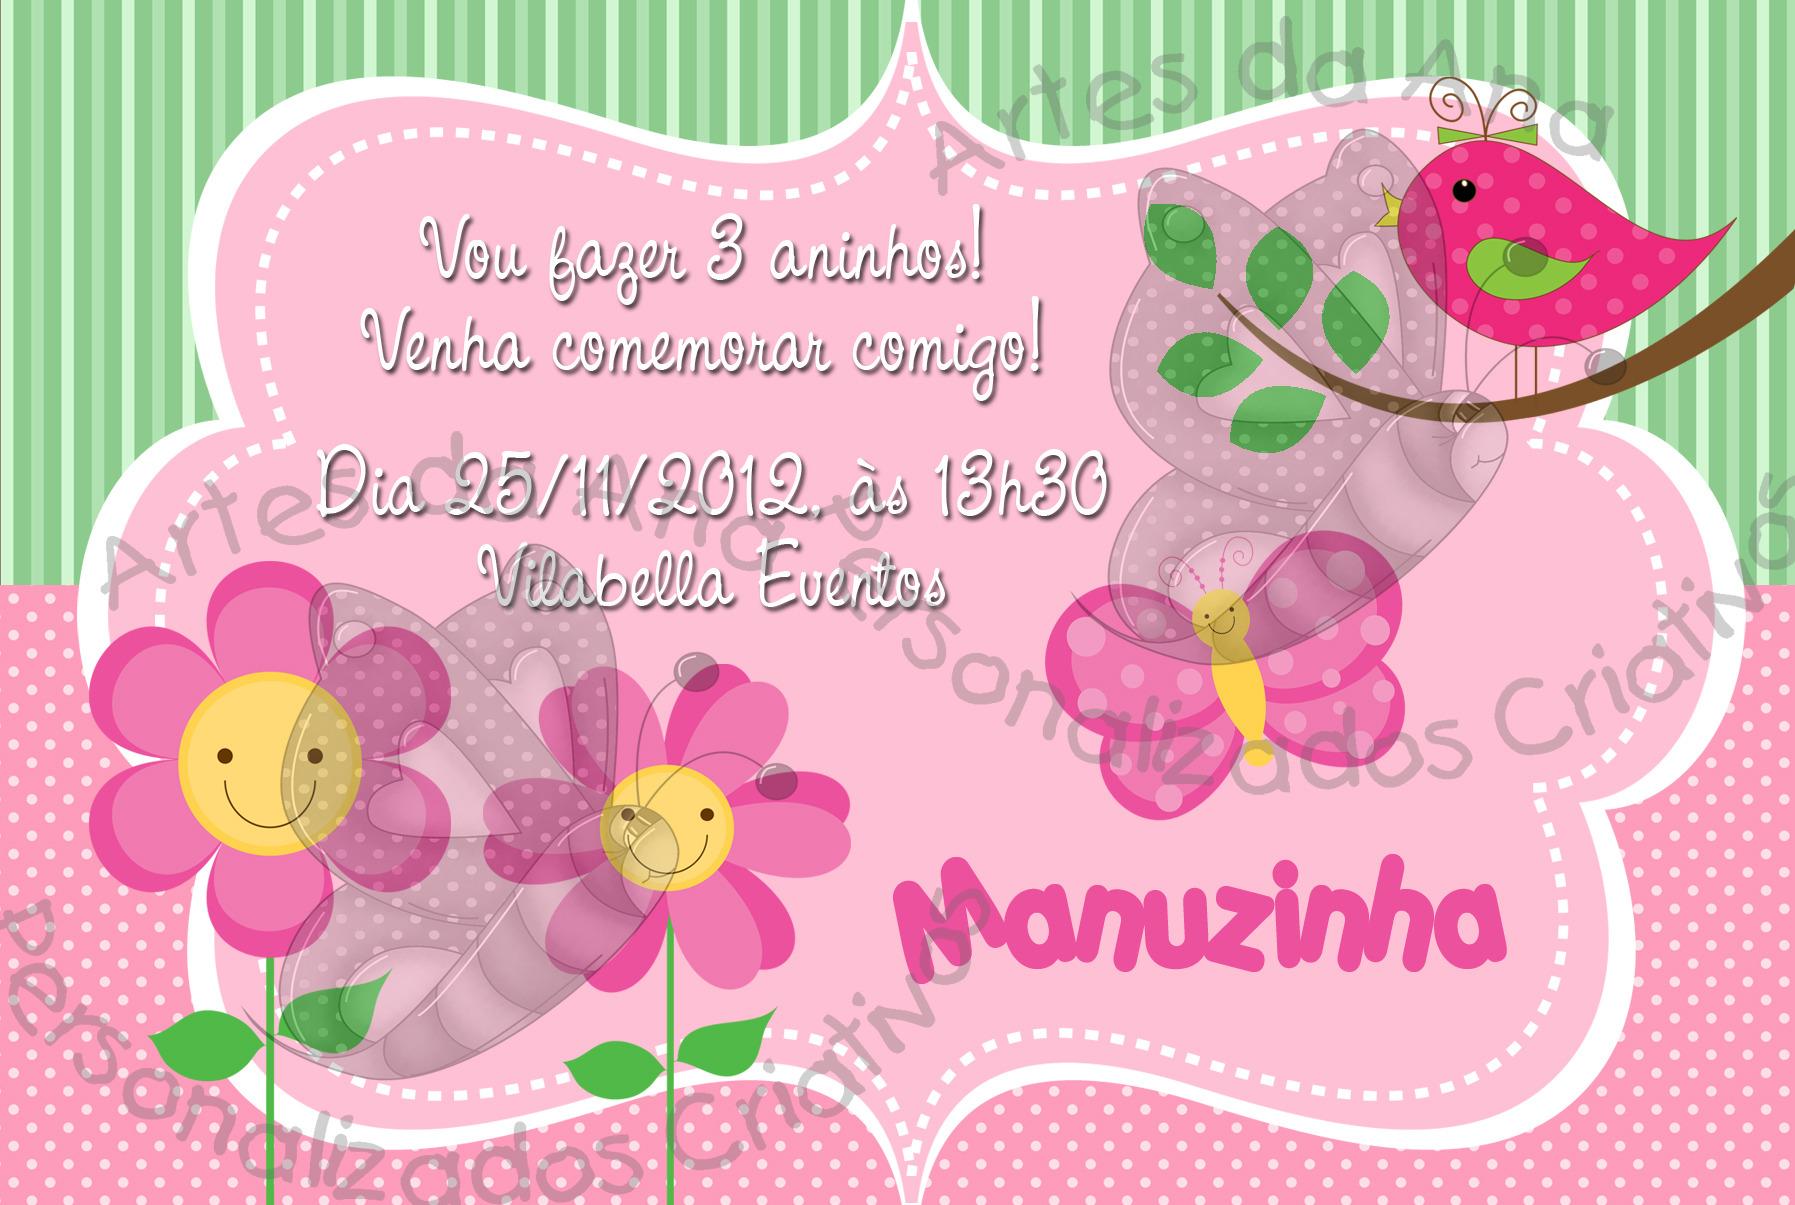 imagens de jardim encantado para convites:50 convite jardim rosa 12x7cm r $ 2 80 convite jardim verde e rosa